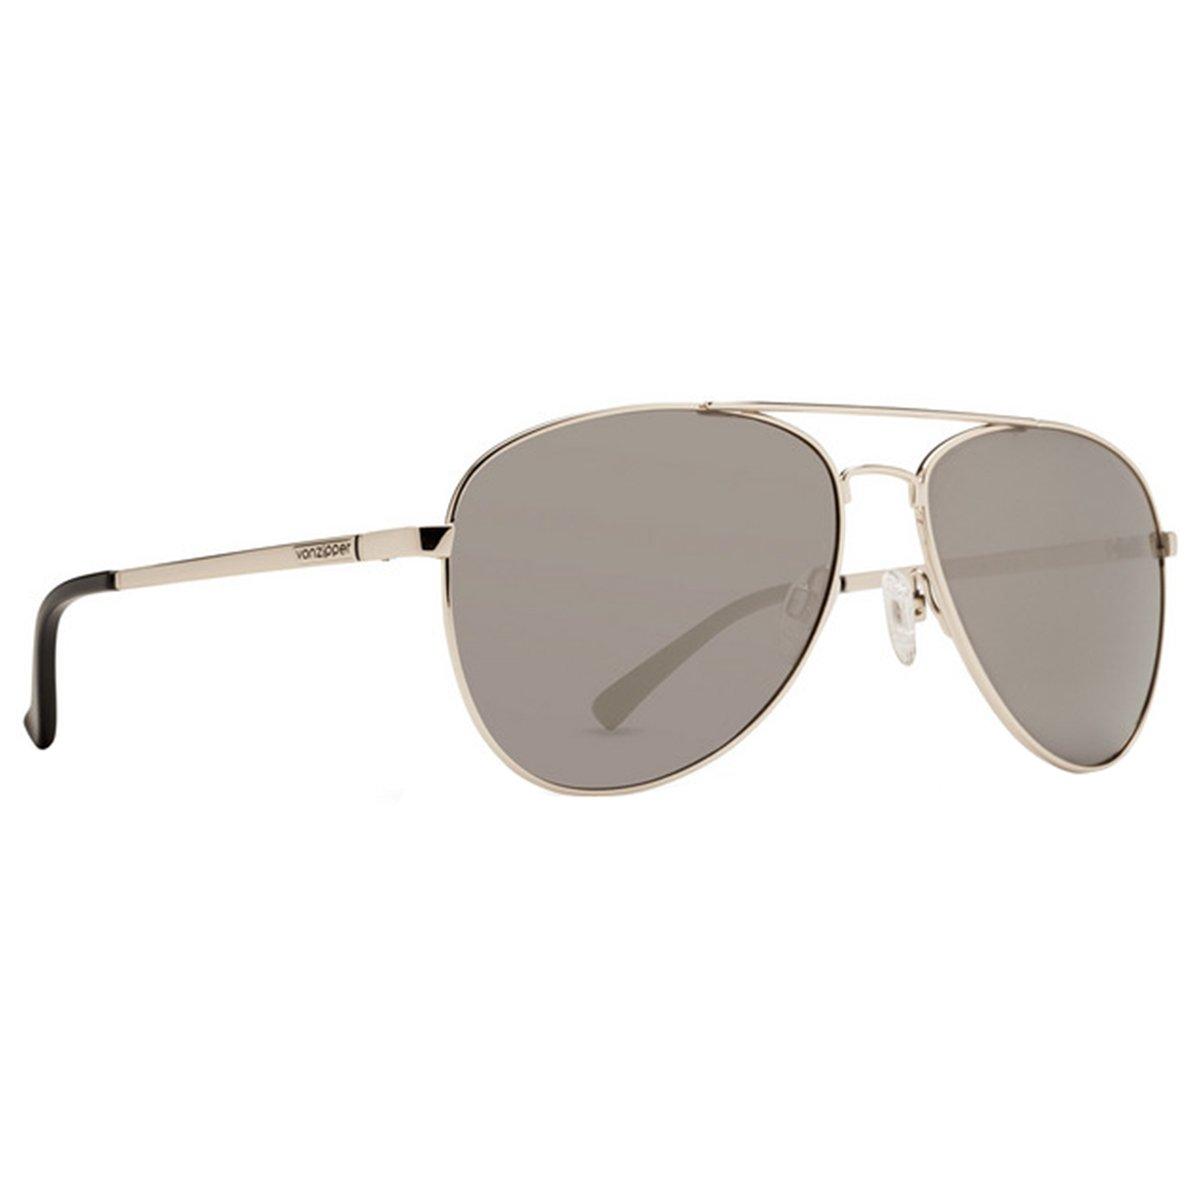 Veezee Dba Von Zipper Farva Aviator Sunglasses